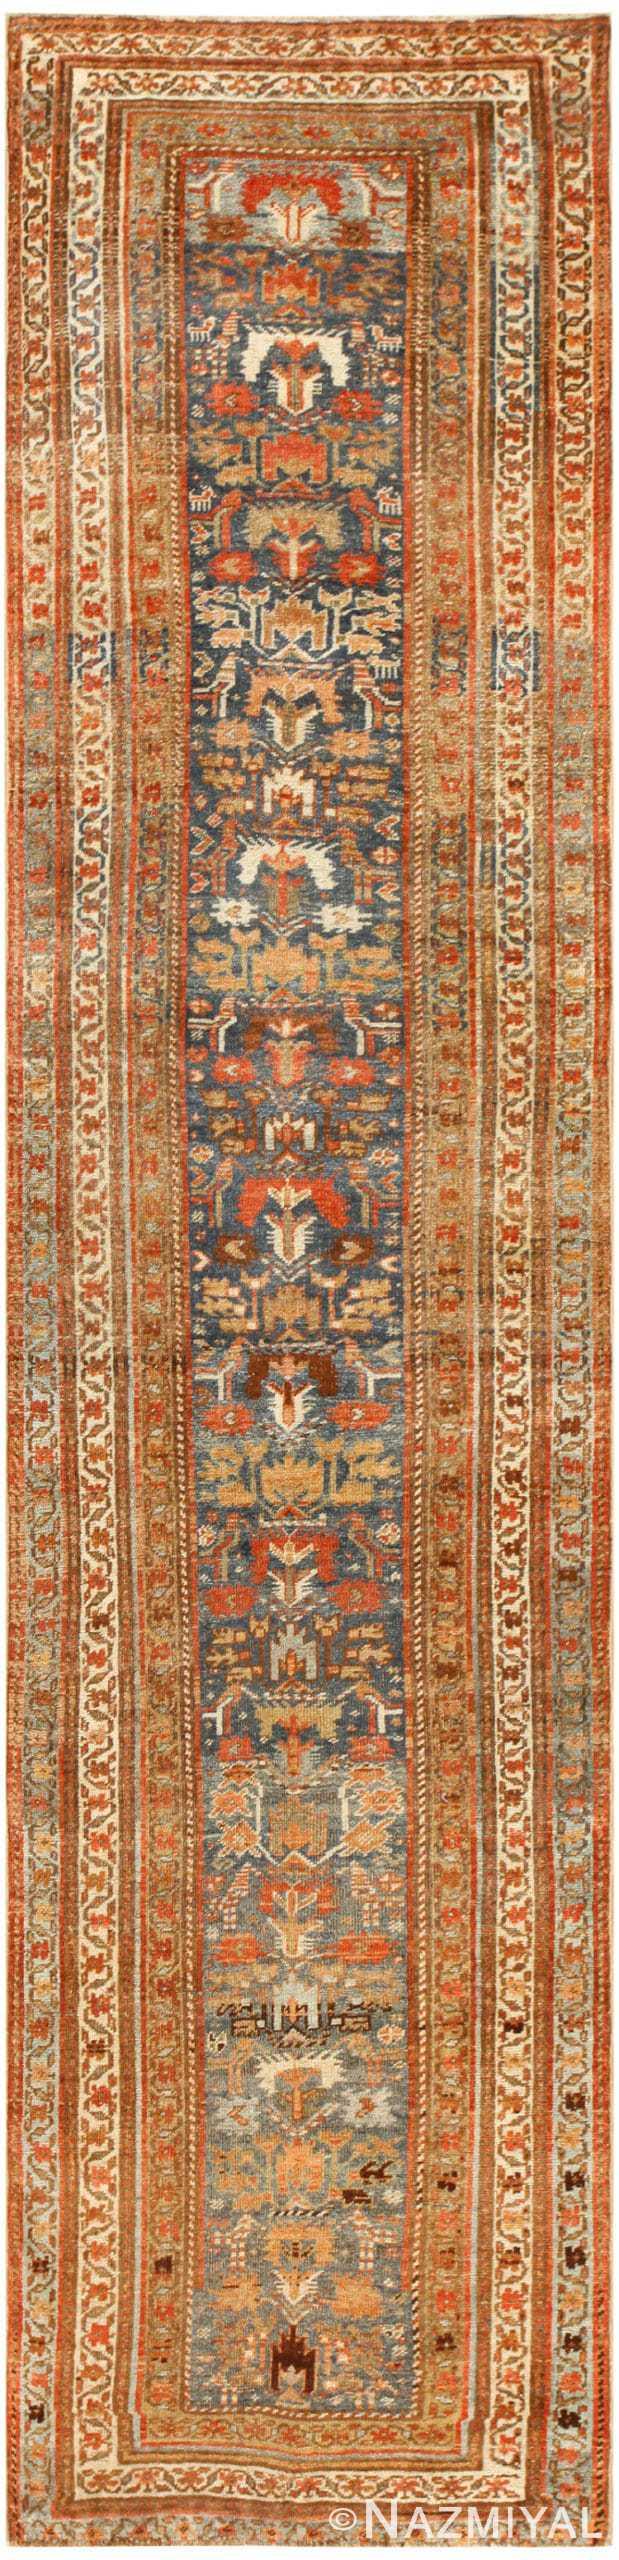 Antique Persian Bidjar Runner Rug 48559 Nazmiyal